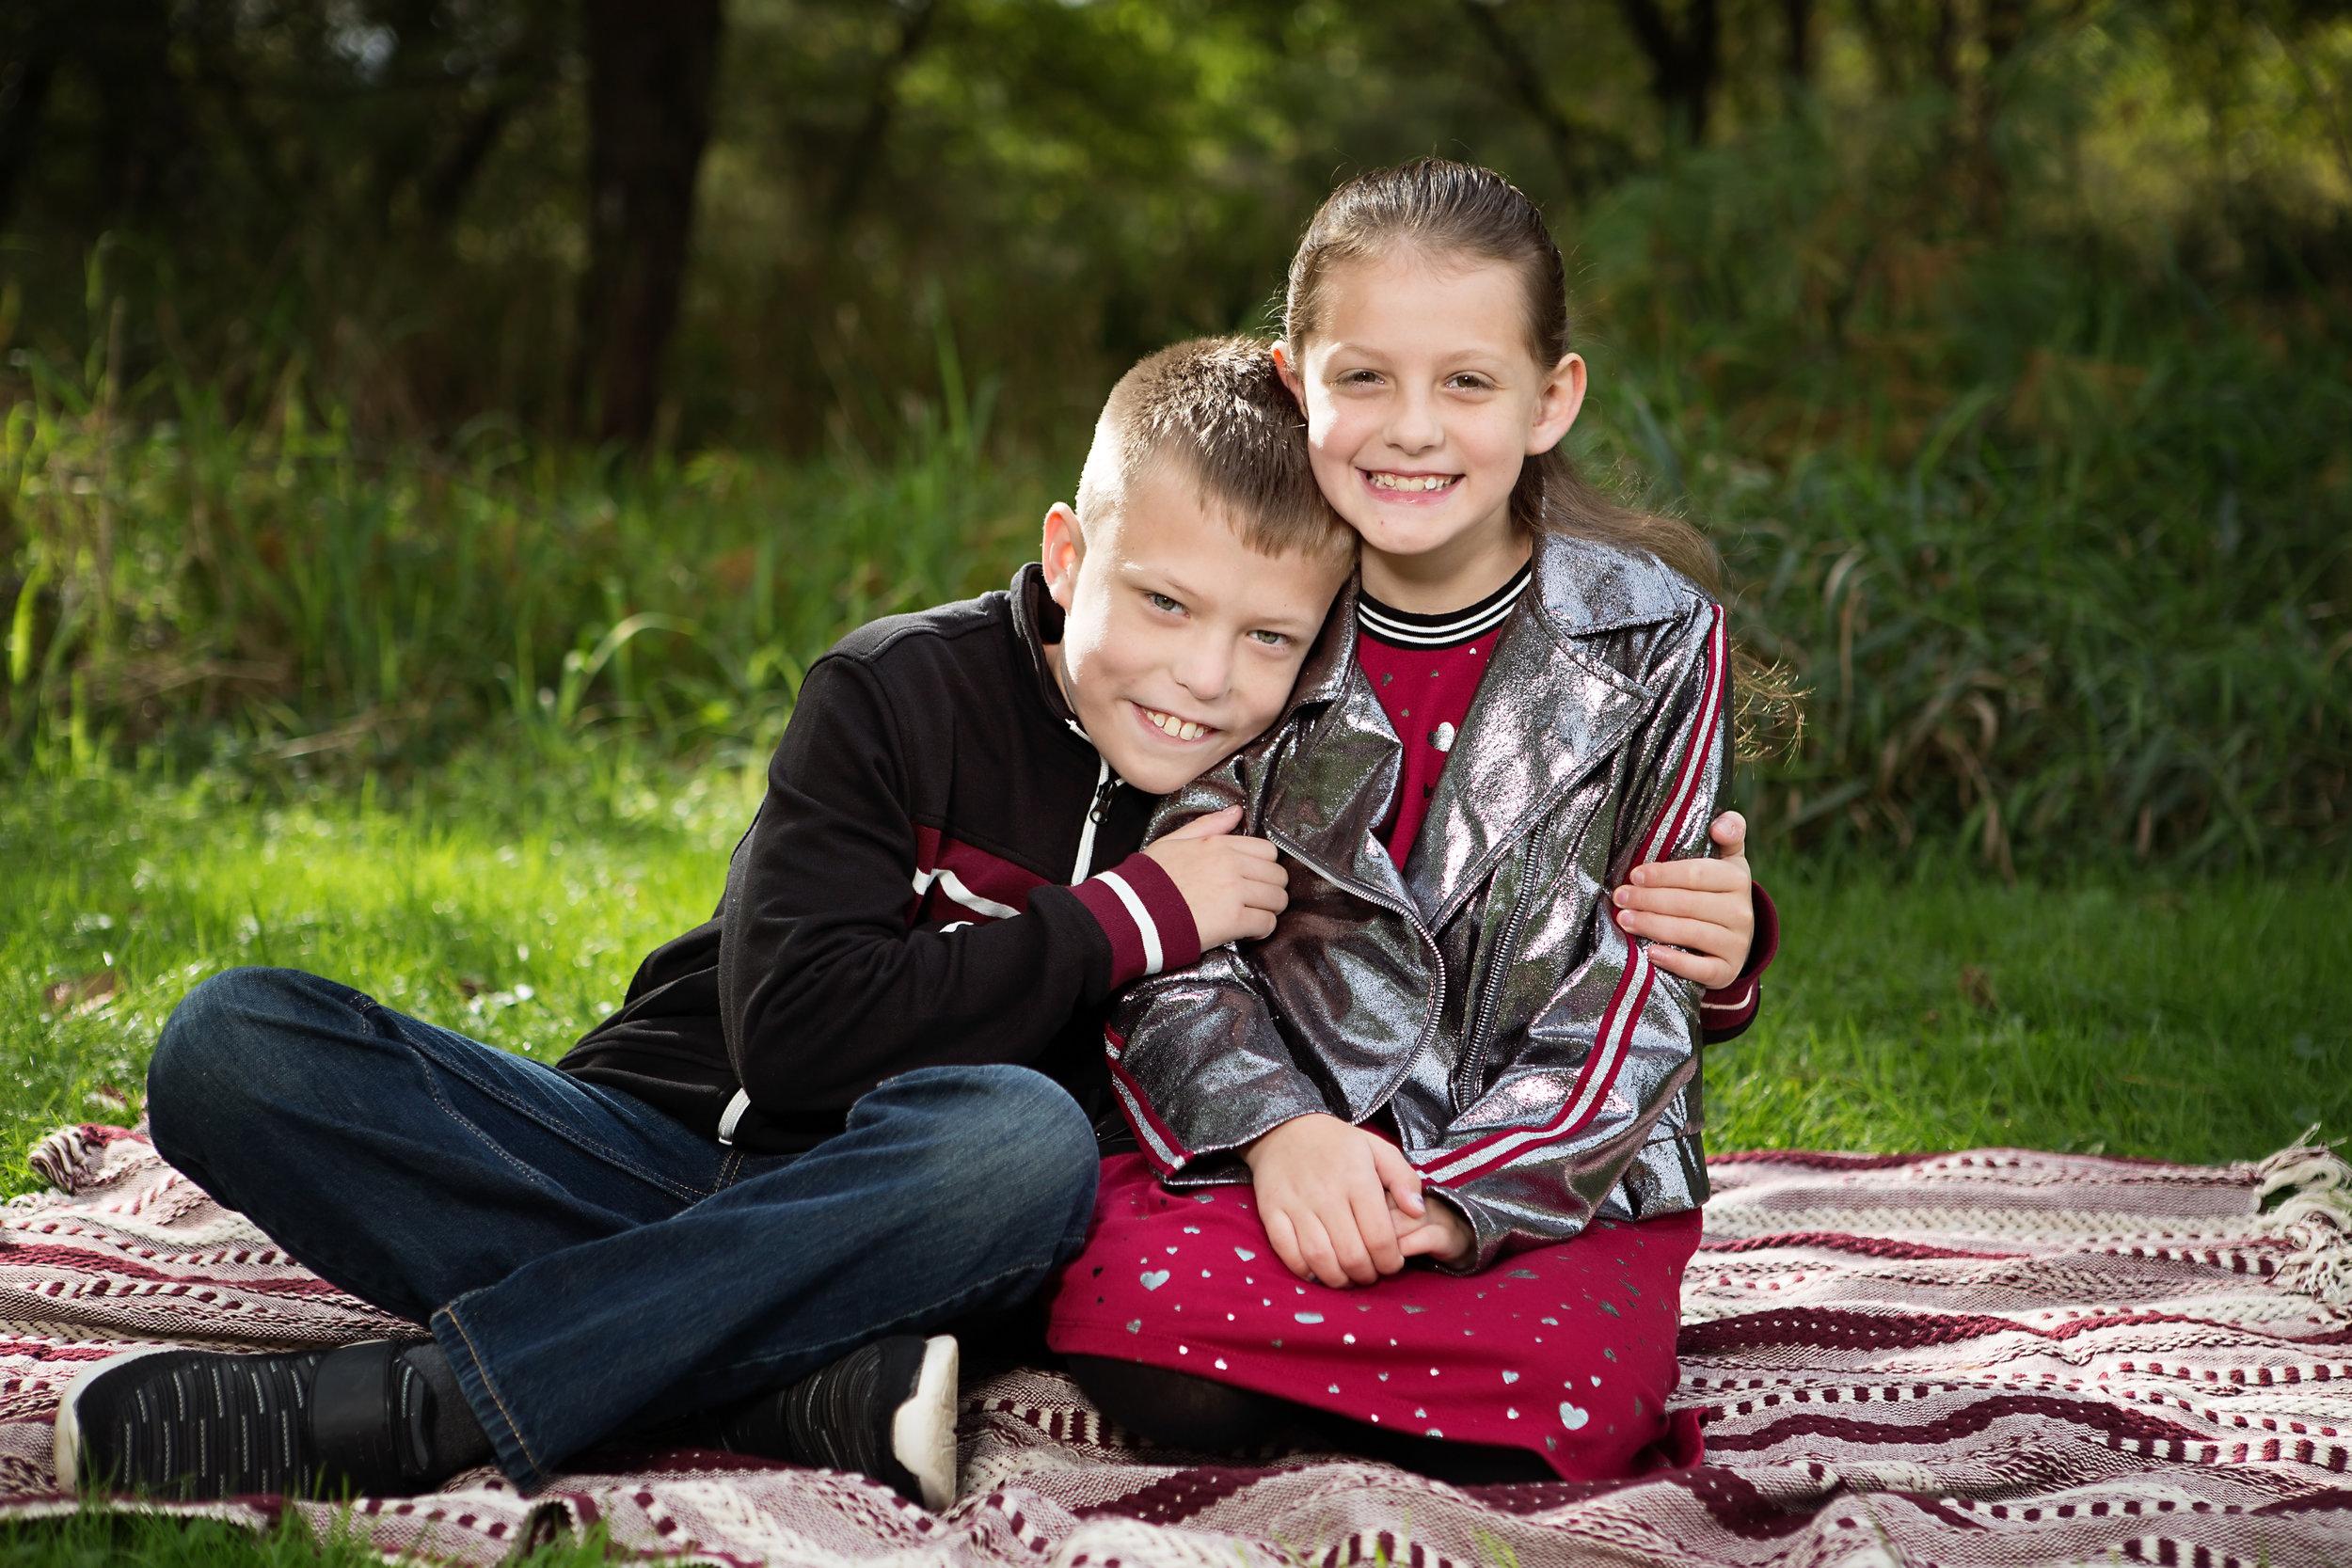 siblings picture